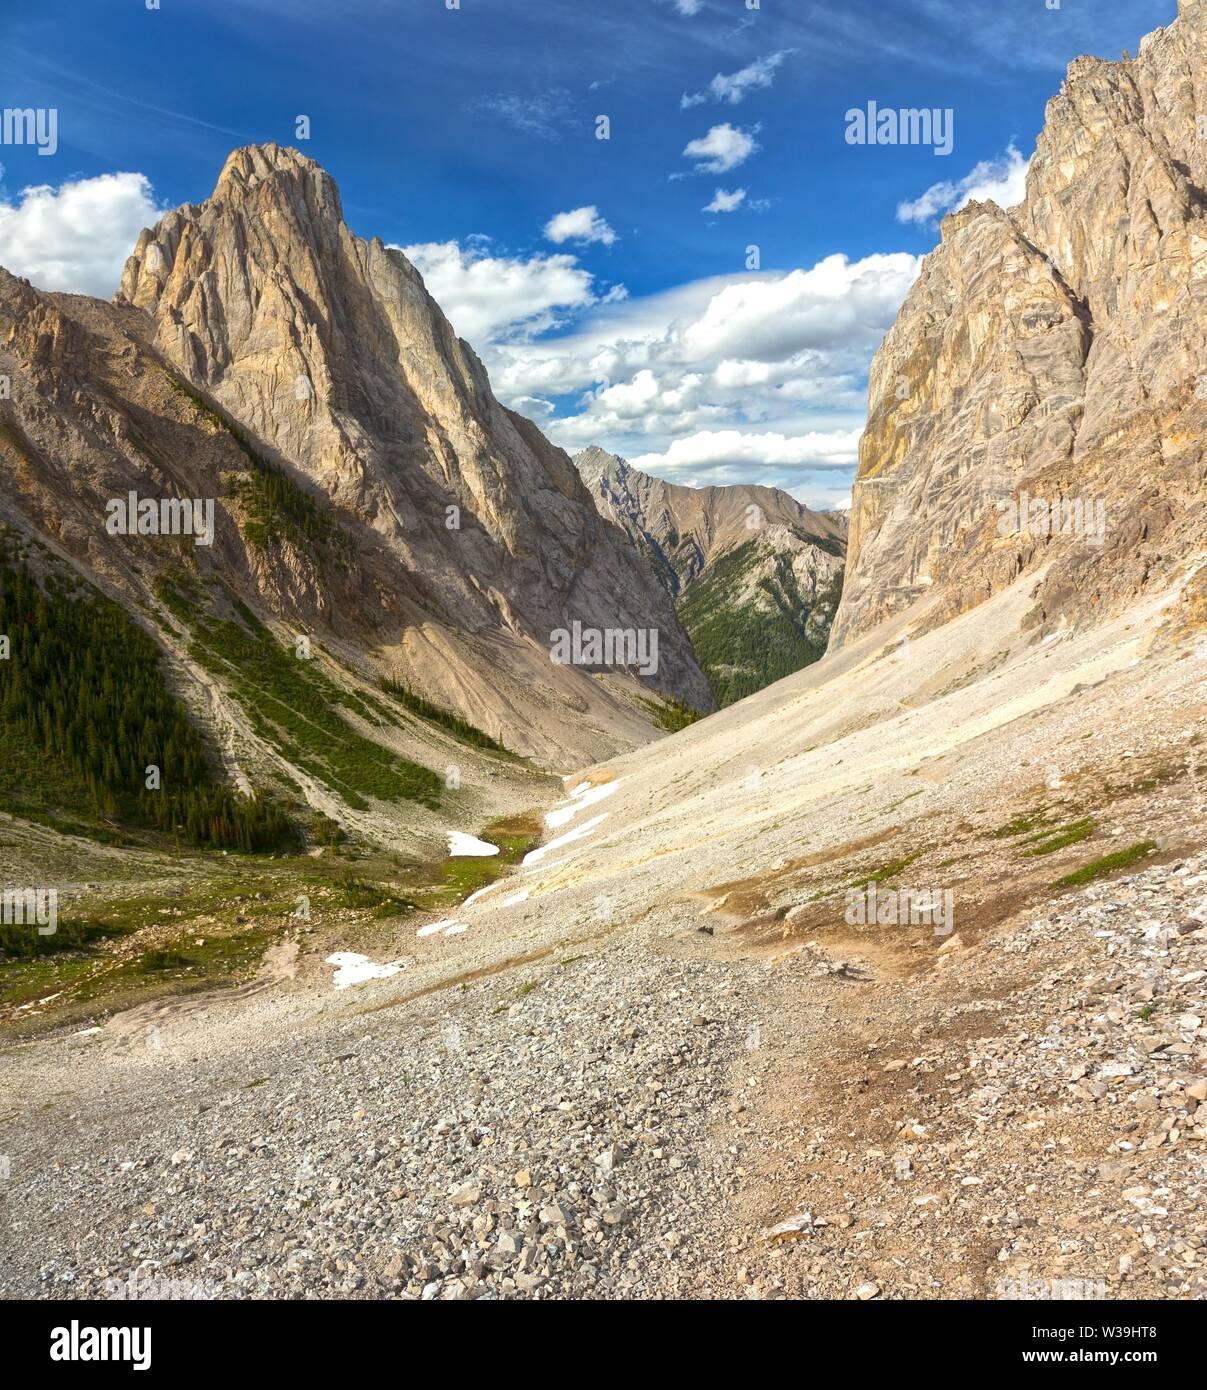 rugged-mountain-rock-landscape-and-drama